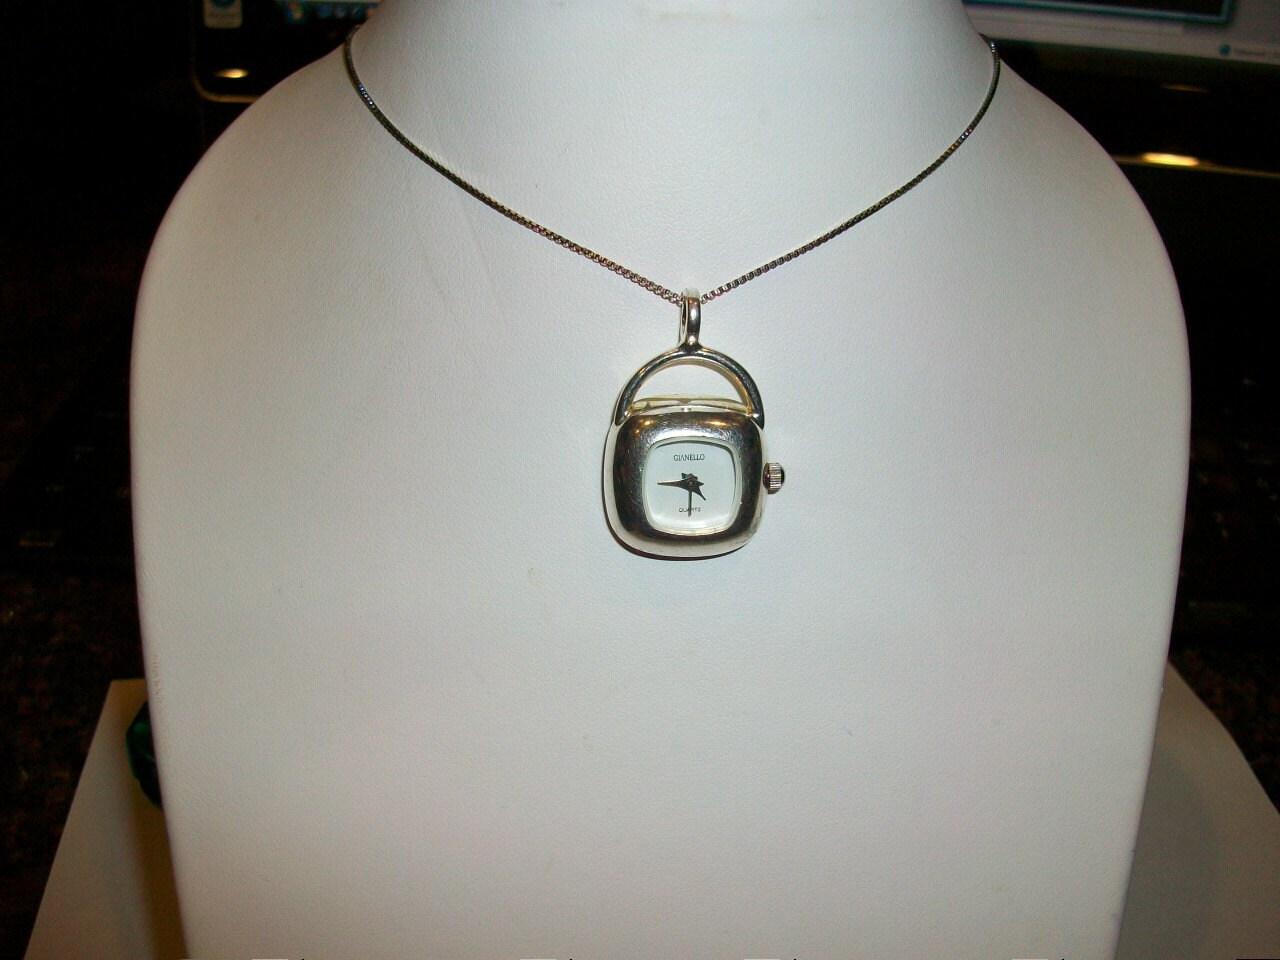 Gianello 925 Sterling Silver Ladies Women's Wristwatch ...